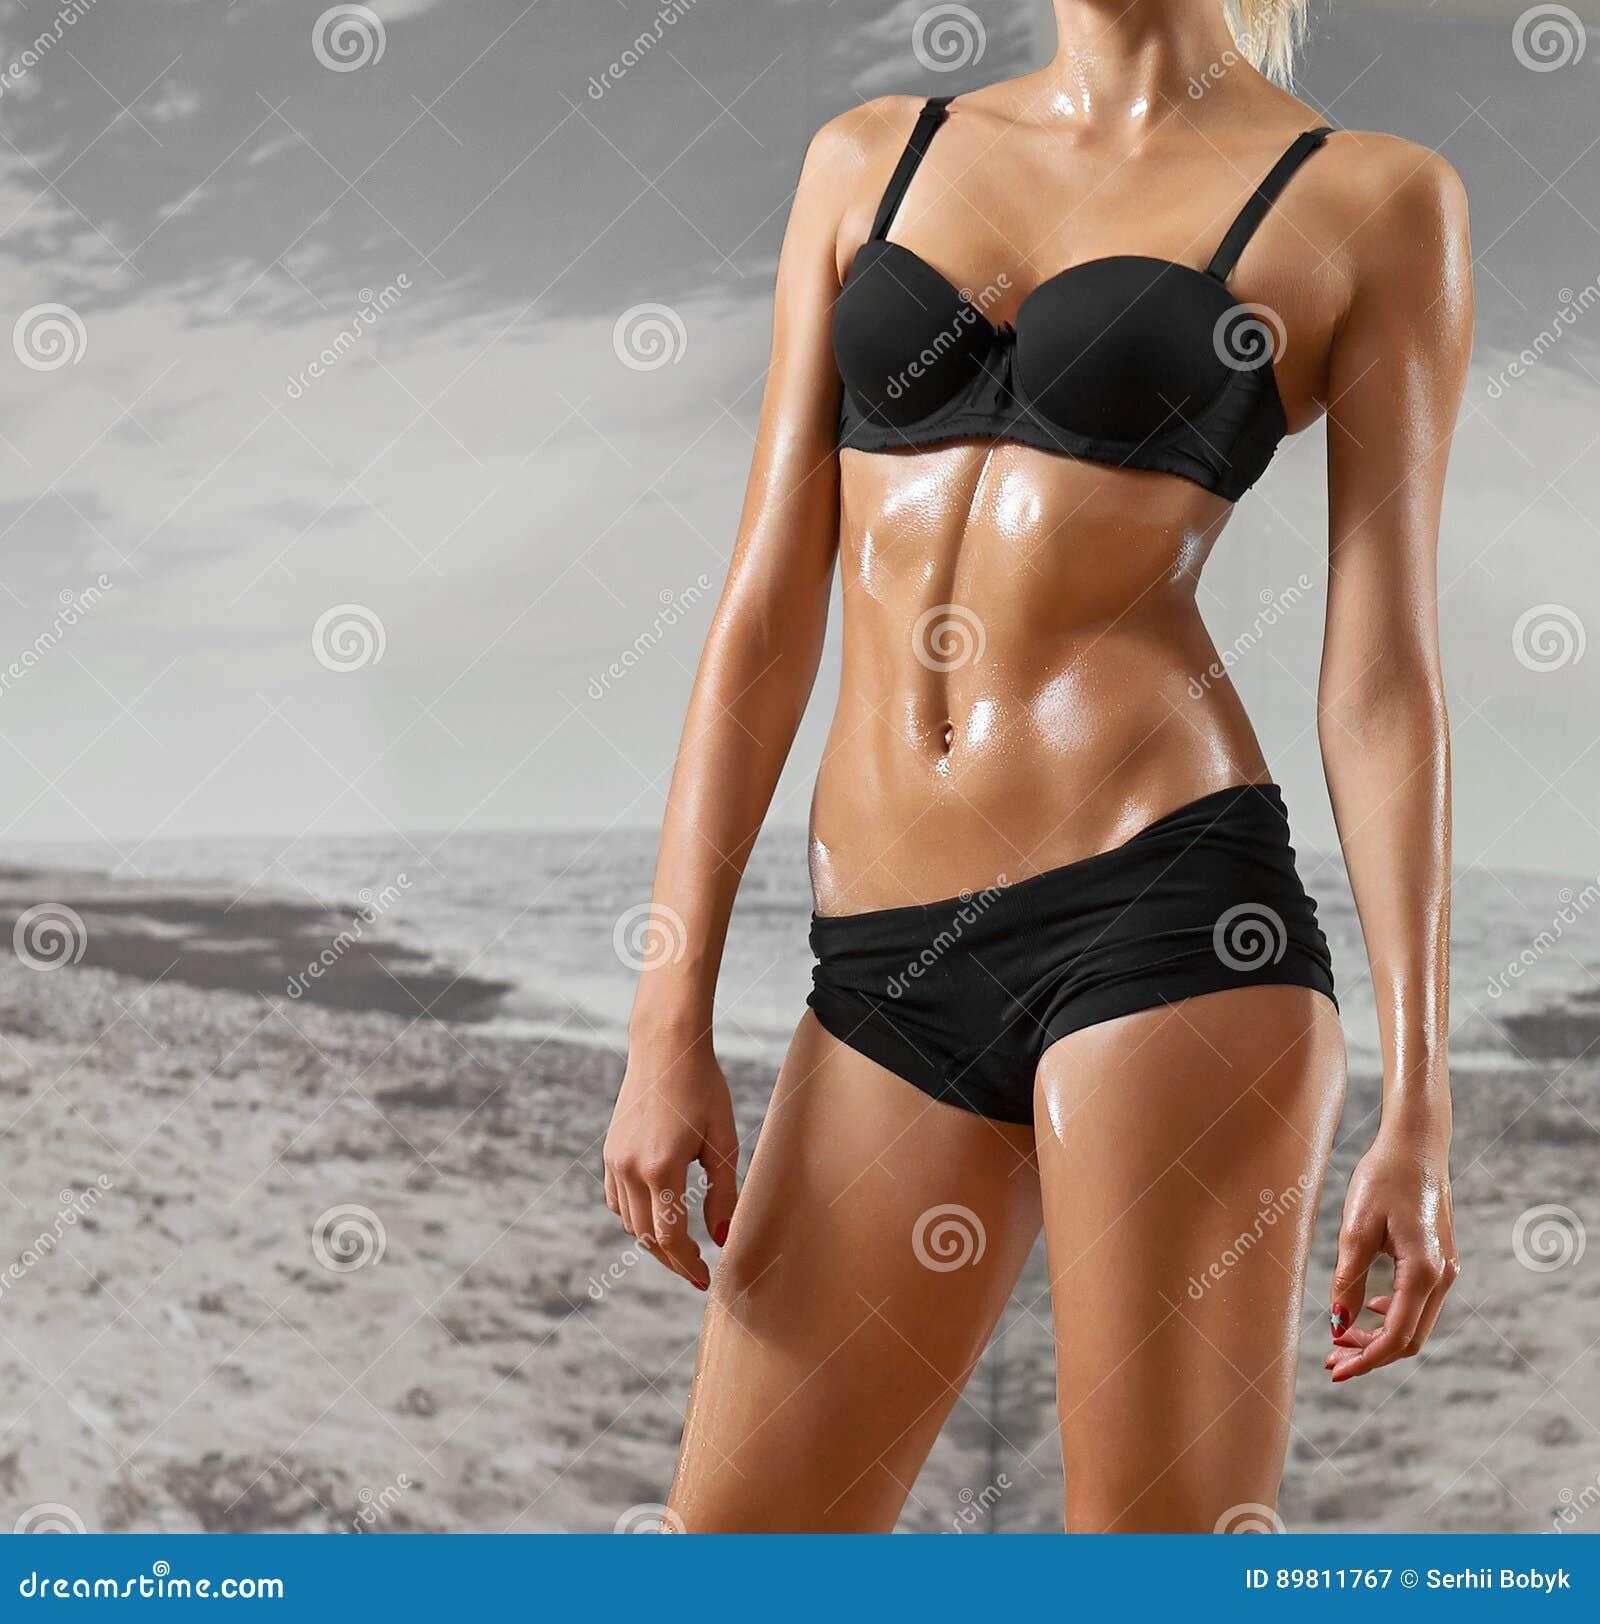 pretty-pussy-athletic-sexy-girl